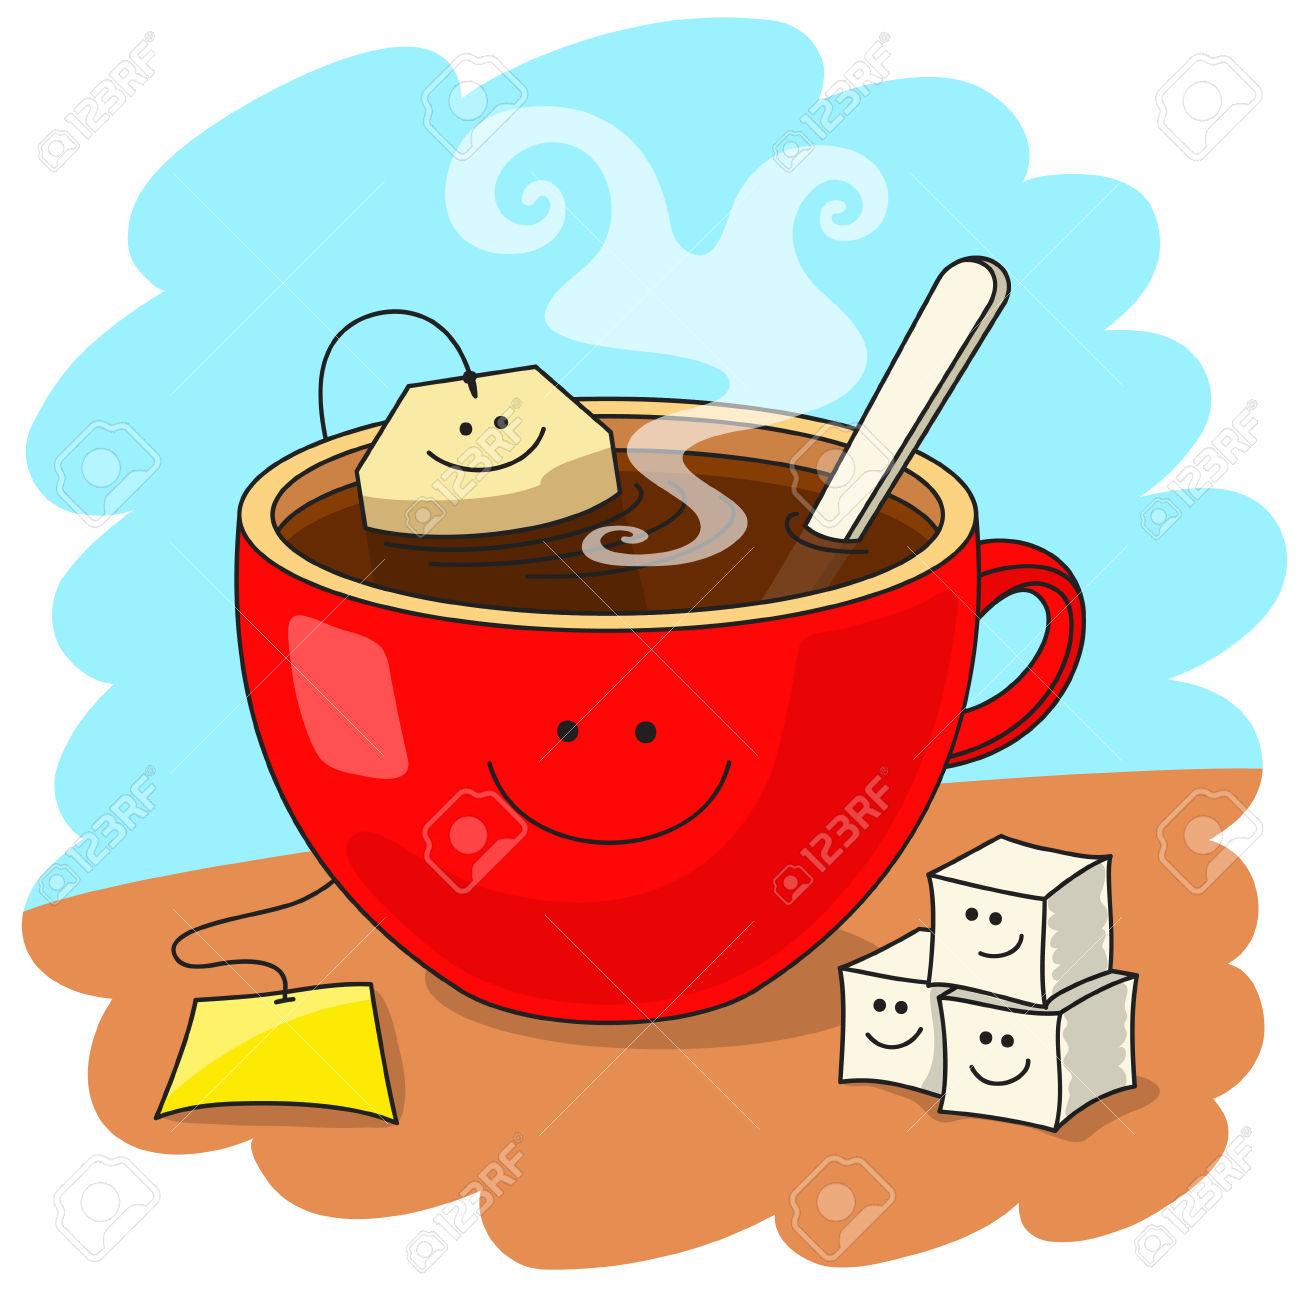 Clipart gute laune picture transparent Red Tasse Tee Mit Teebeutel Im Inneren. Lustige Lächelnde ... picture transparent